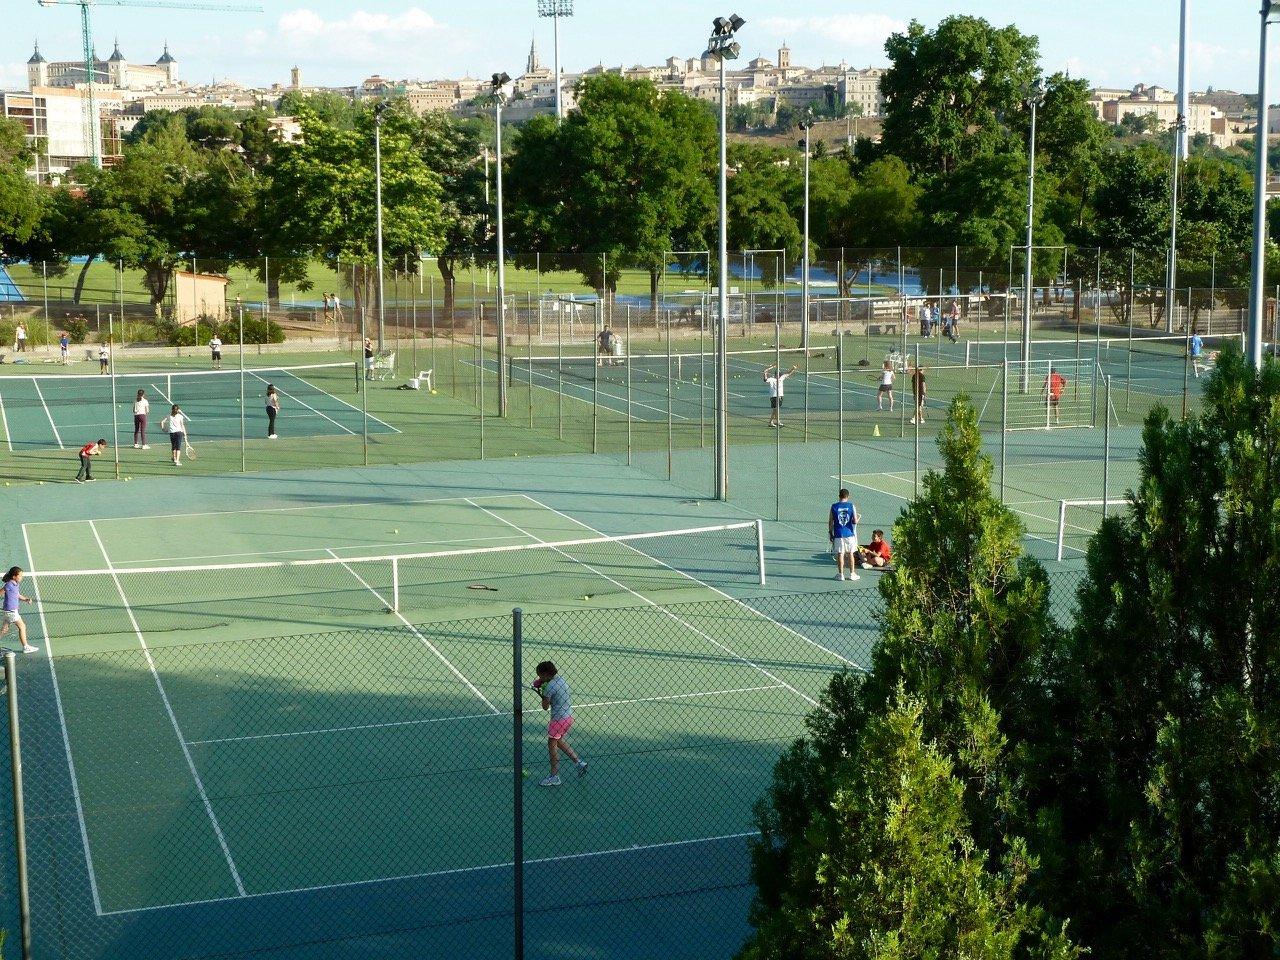 tennis-tourist-toledo-spain-patronada-deportivo-municipal-tennis-courts-from-above-teri-church